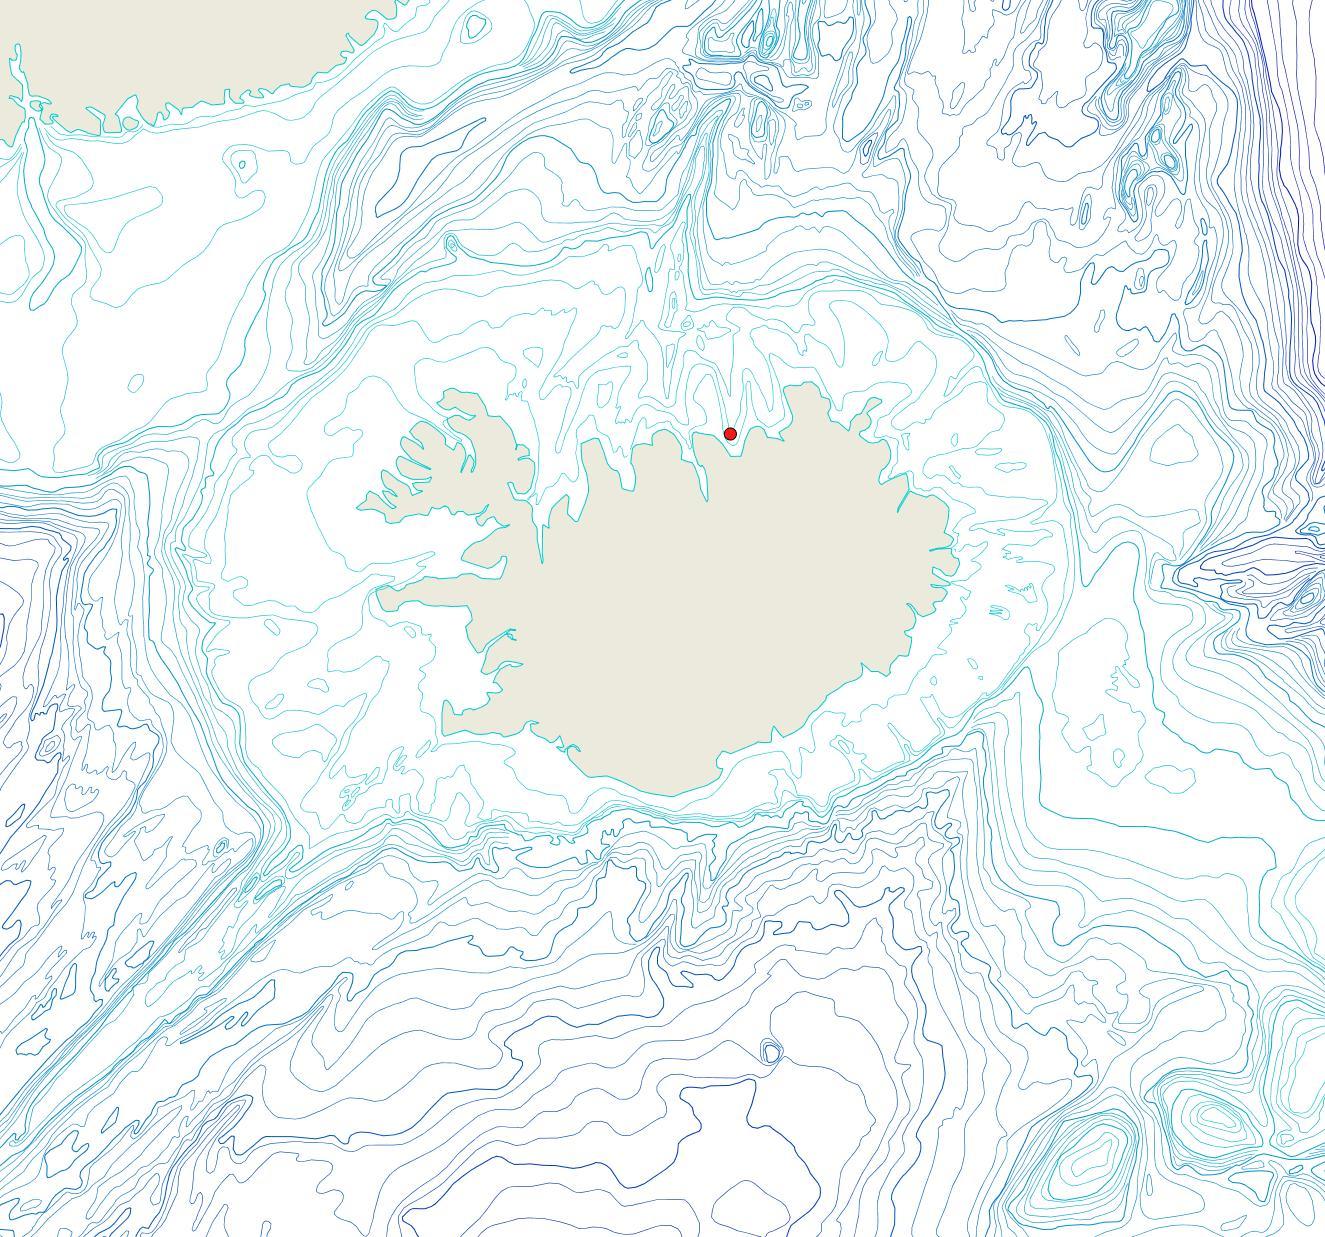 Útbreiðsla Tegella arctica(Bioice samples, red dots)